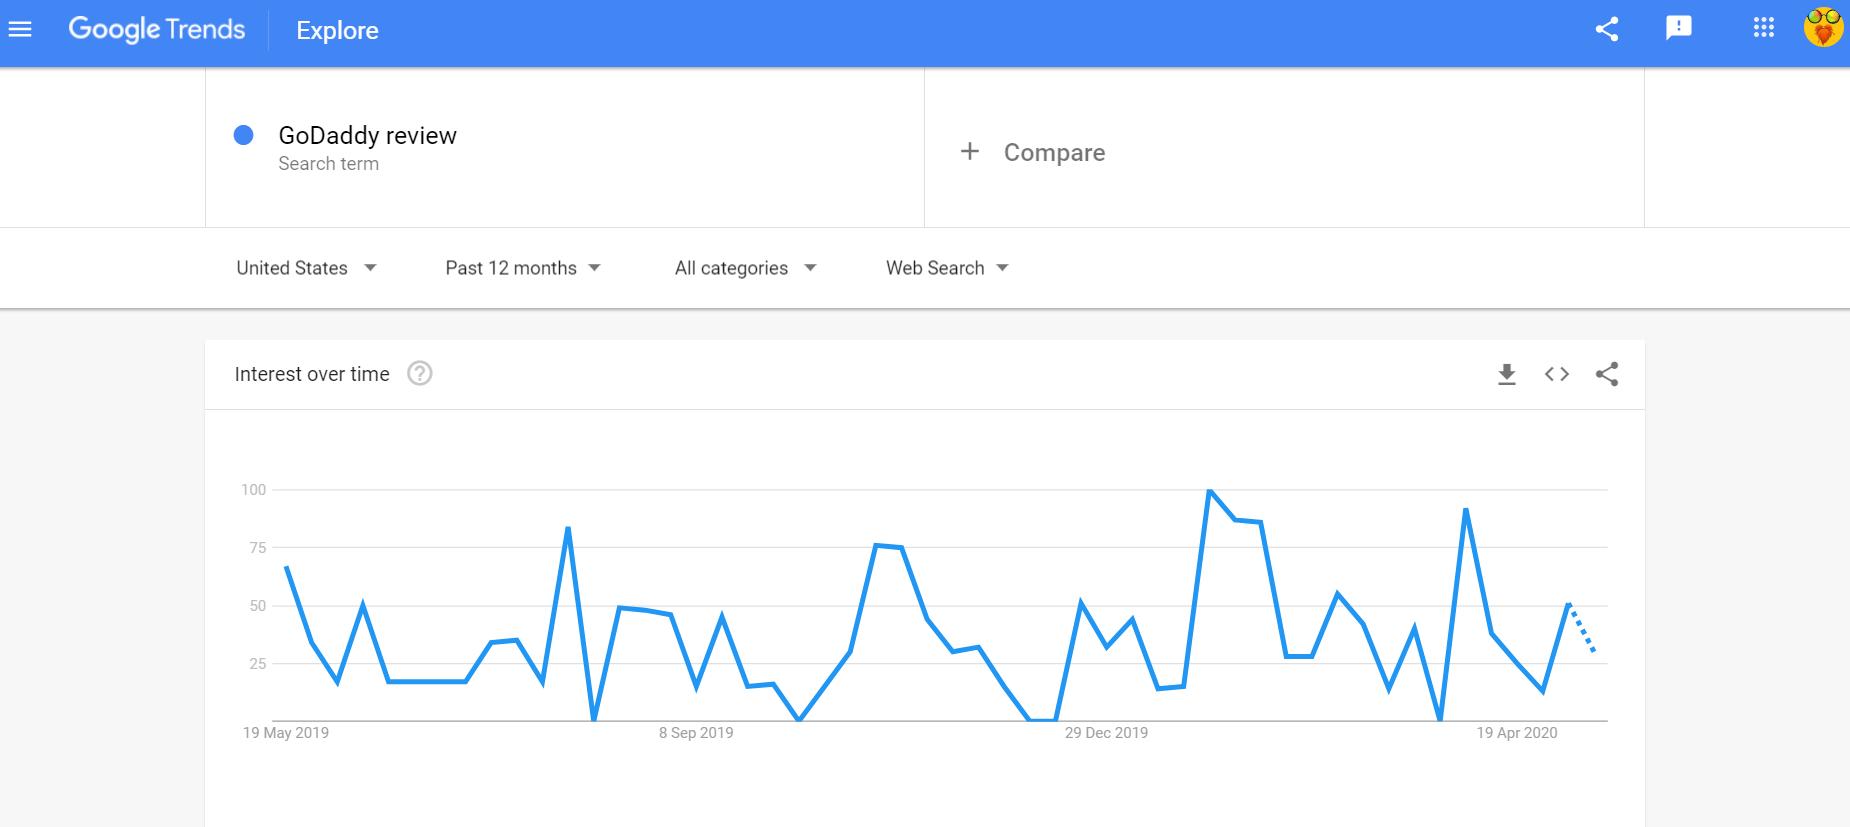 Google Trends GoDaddy review